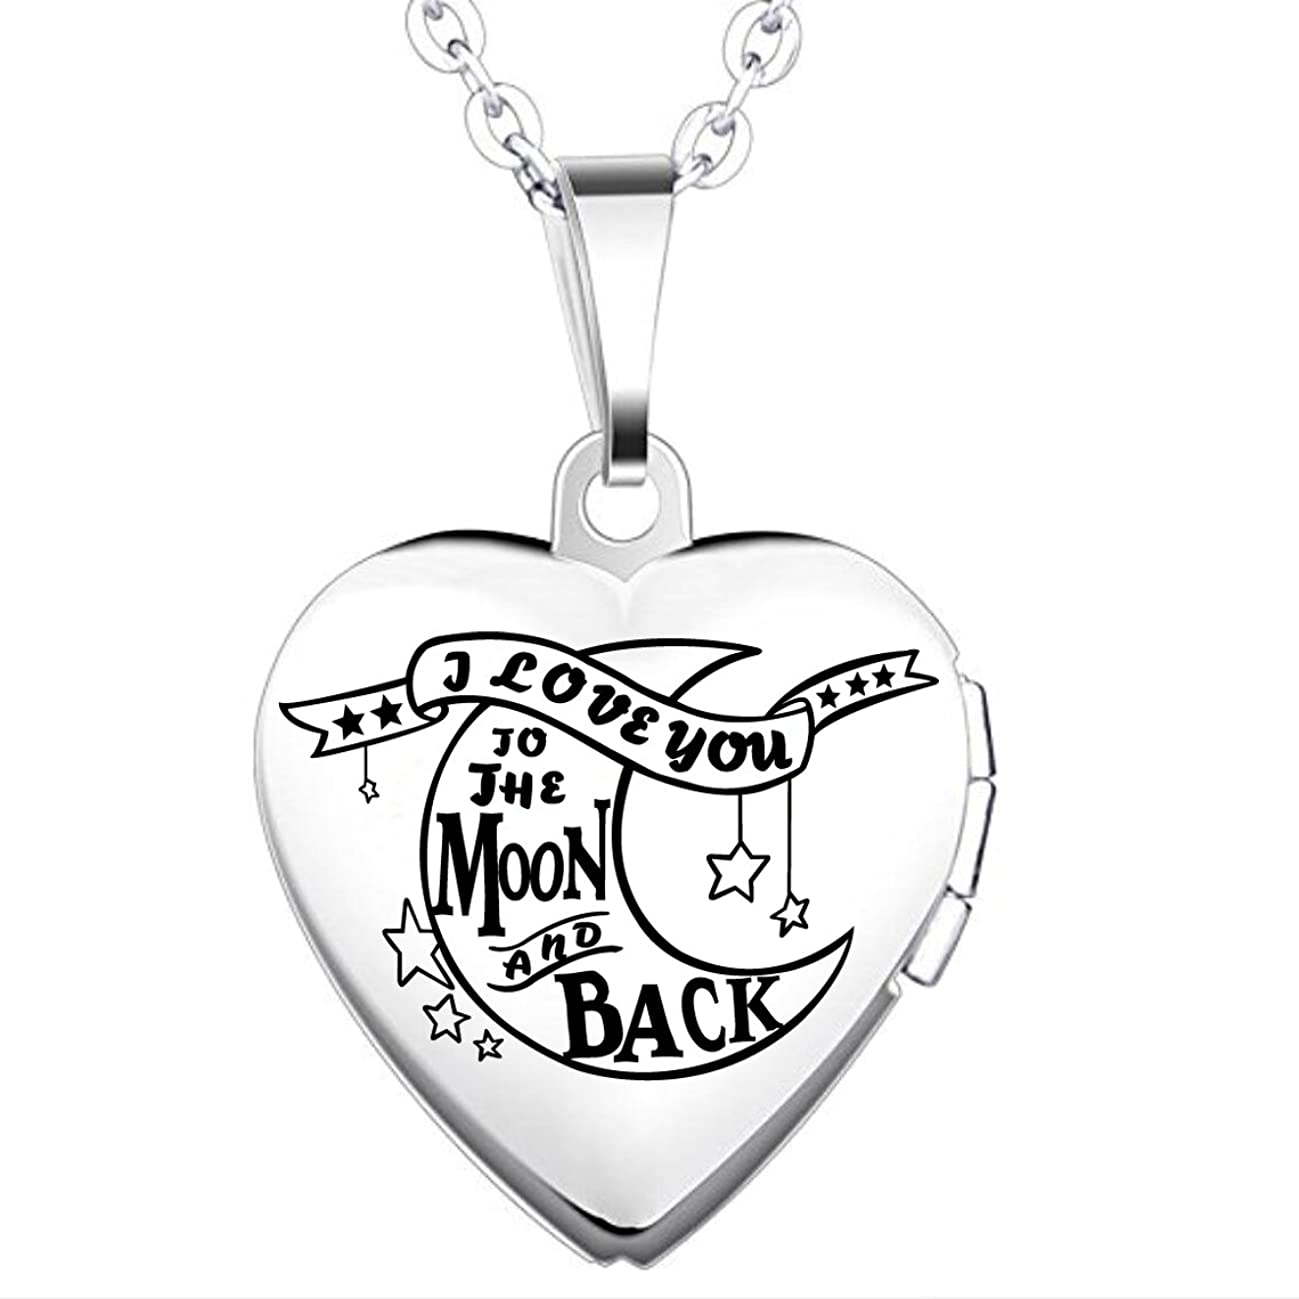 IXIQI Locket I Love You to the Moon and Back Titanium Heart Infinity Love Locket Necklace